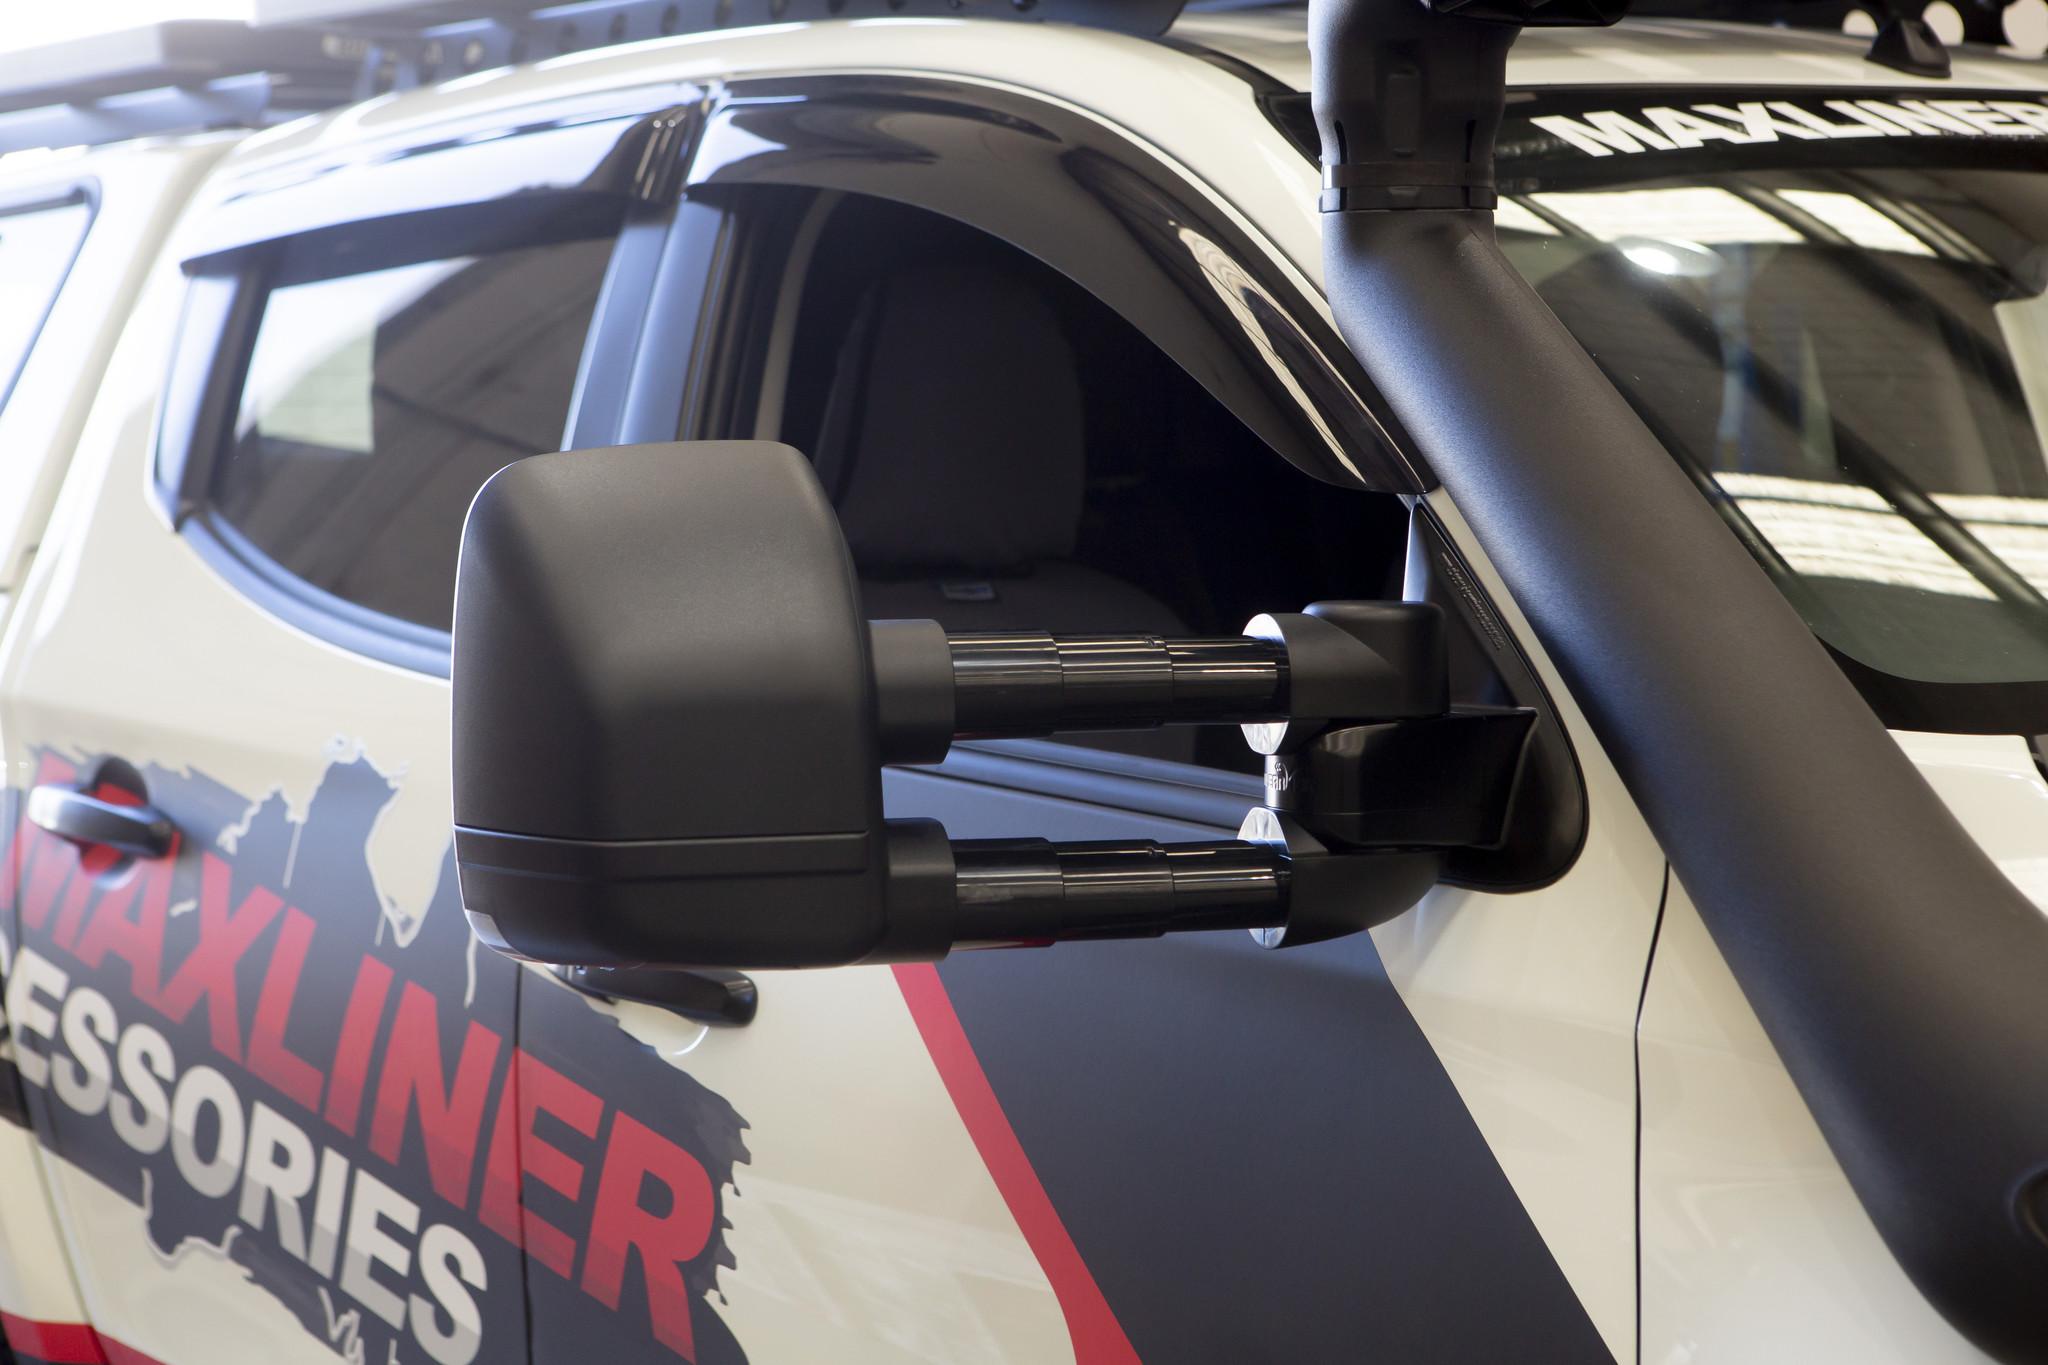 Toyota NEXT GENERATION: Clearview Extra breite spiegel Mitsubishi L200 2015+